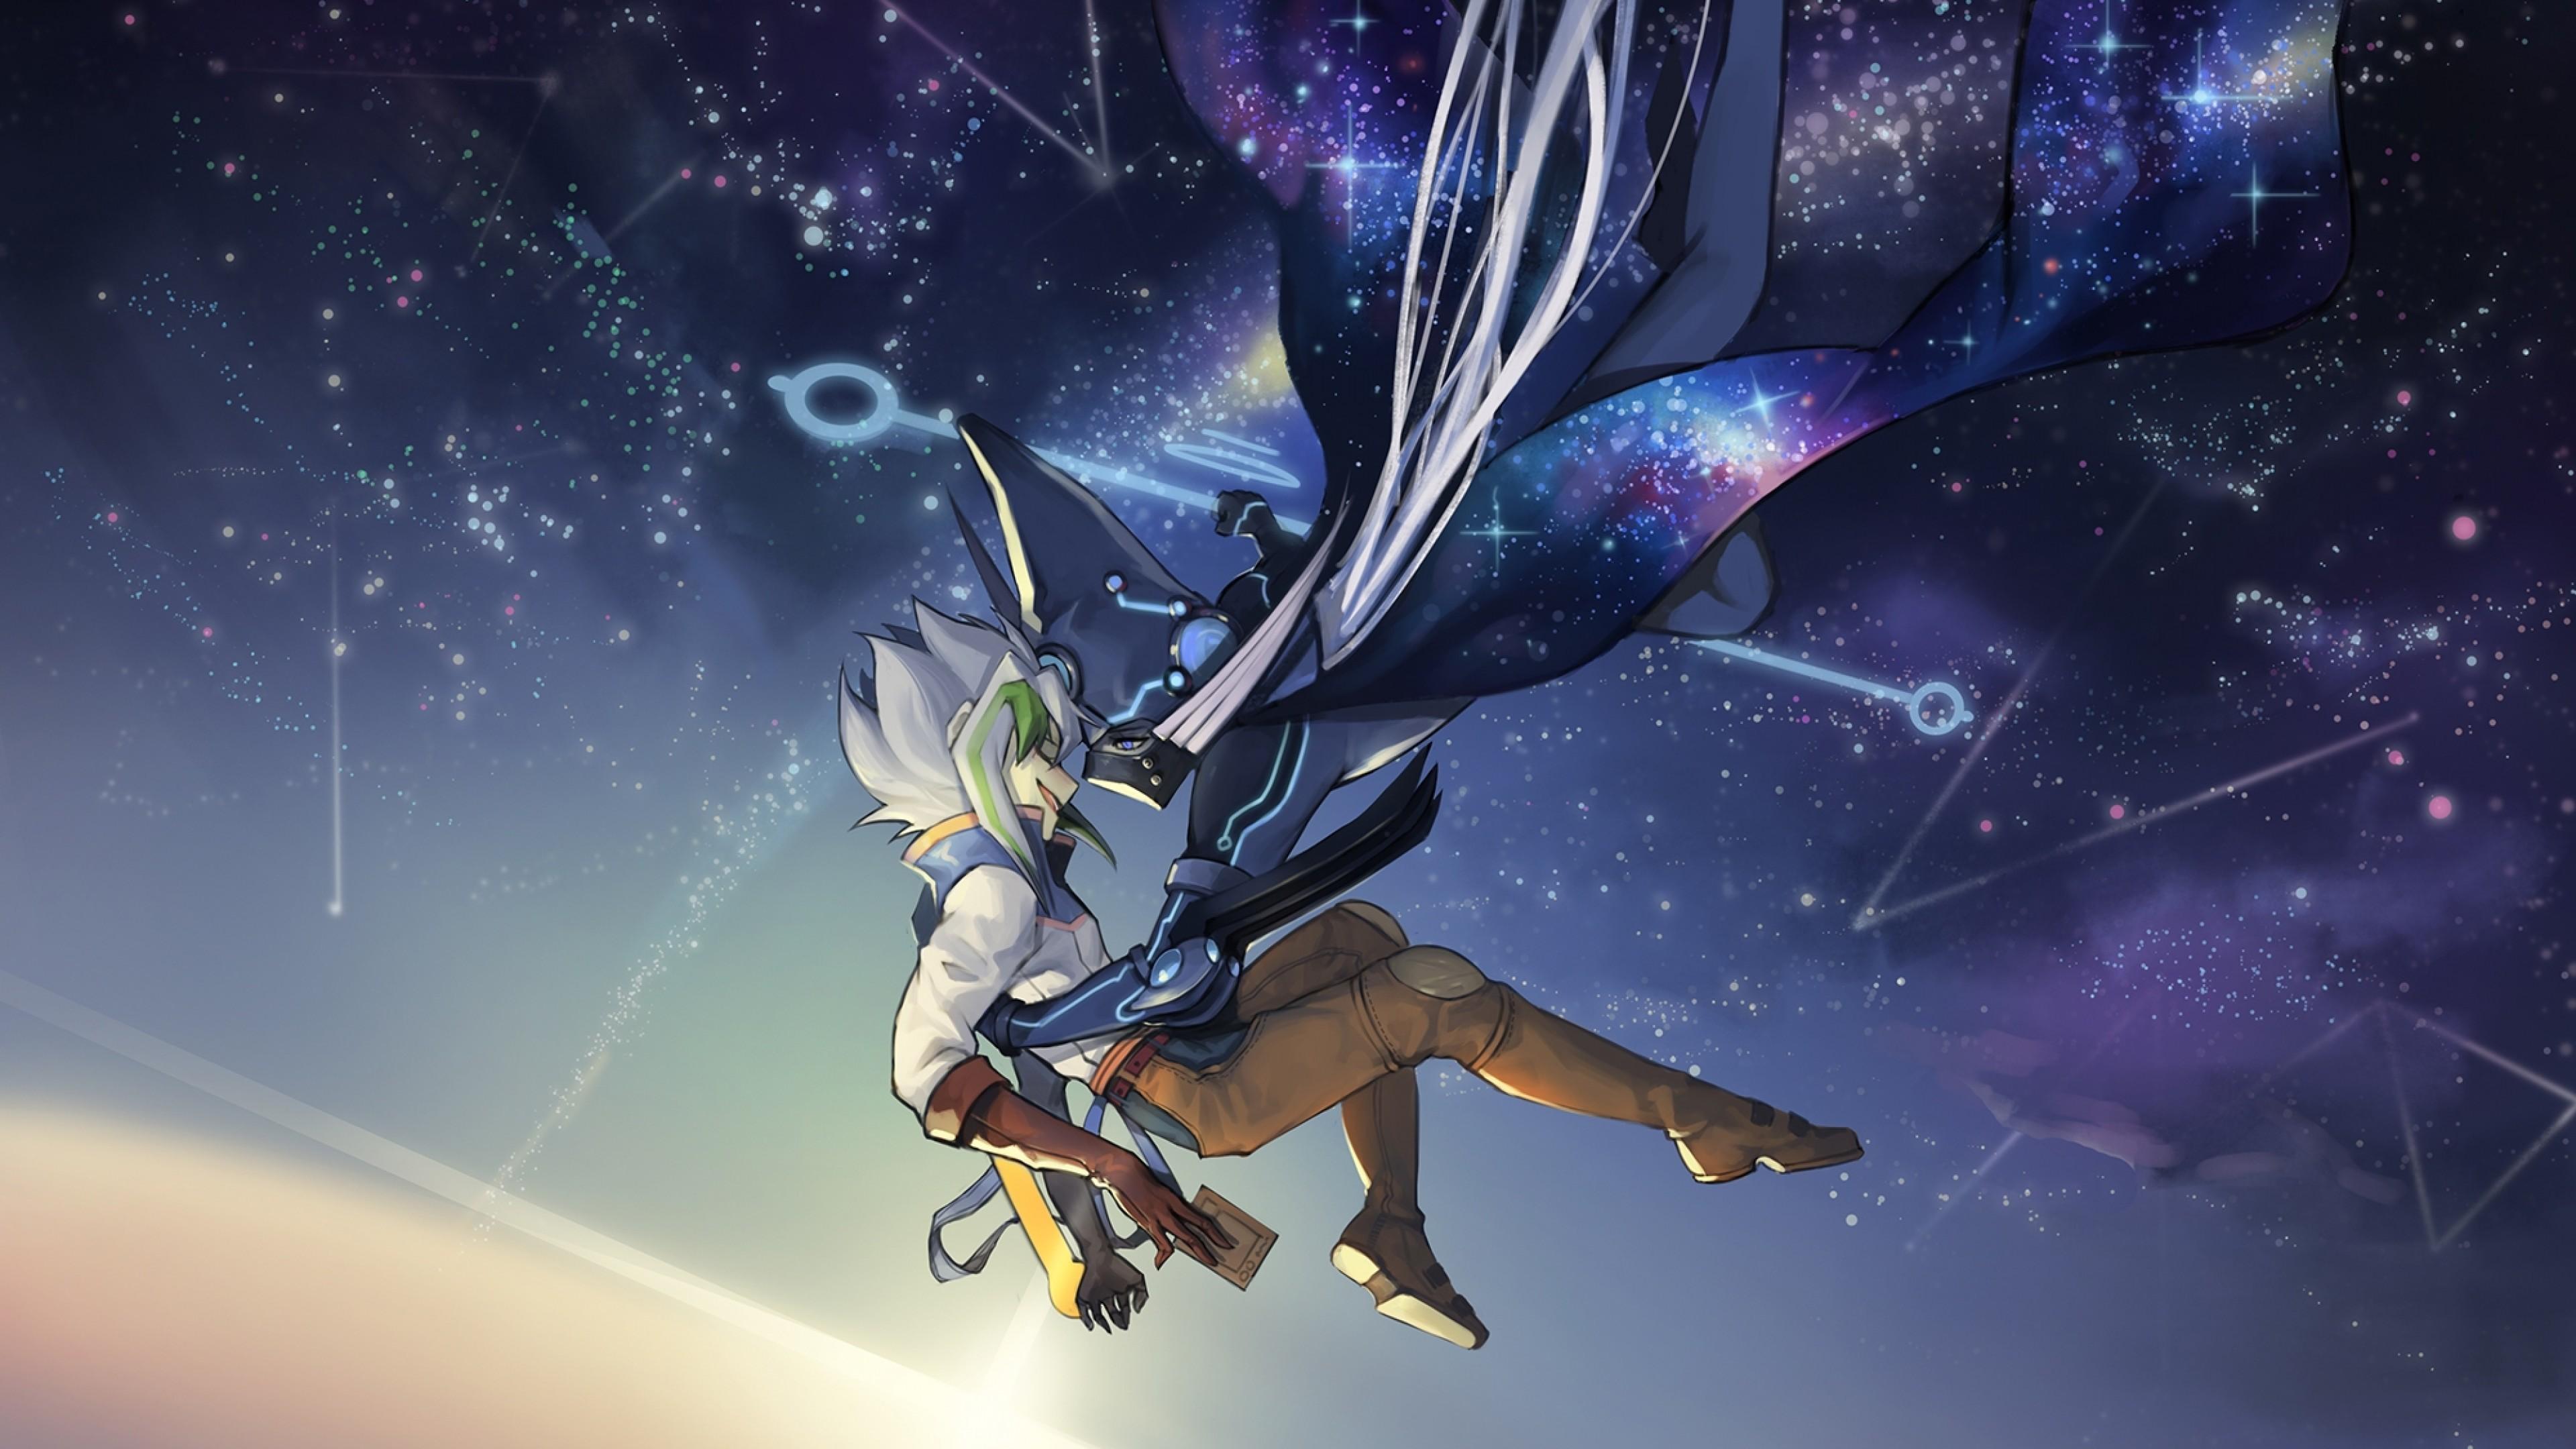 3840x2160 Astrograph Sorcerer, Zarc, Yu-gi-oh Arc V